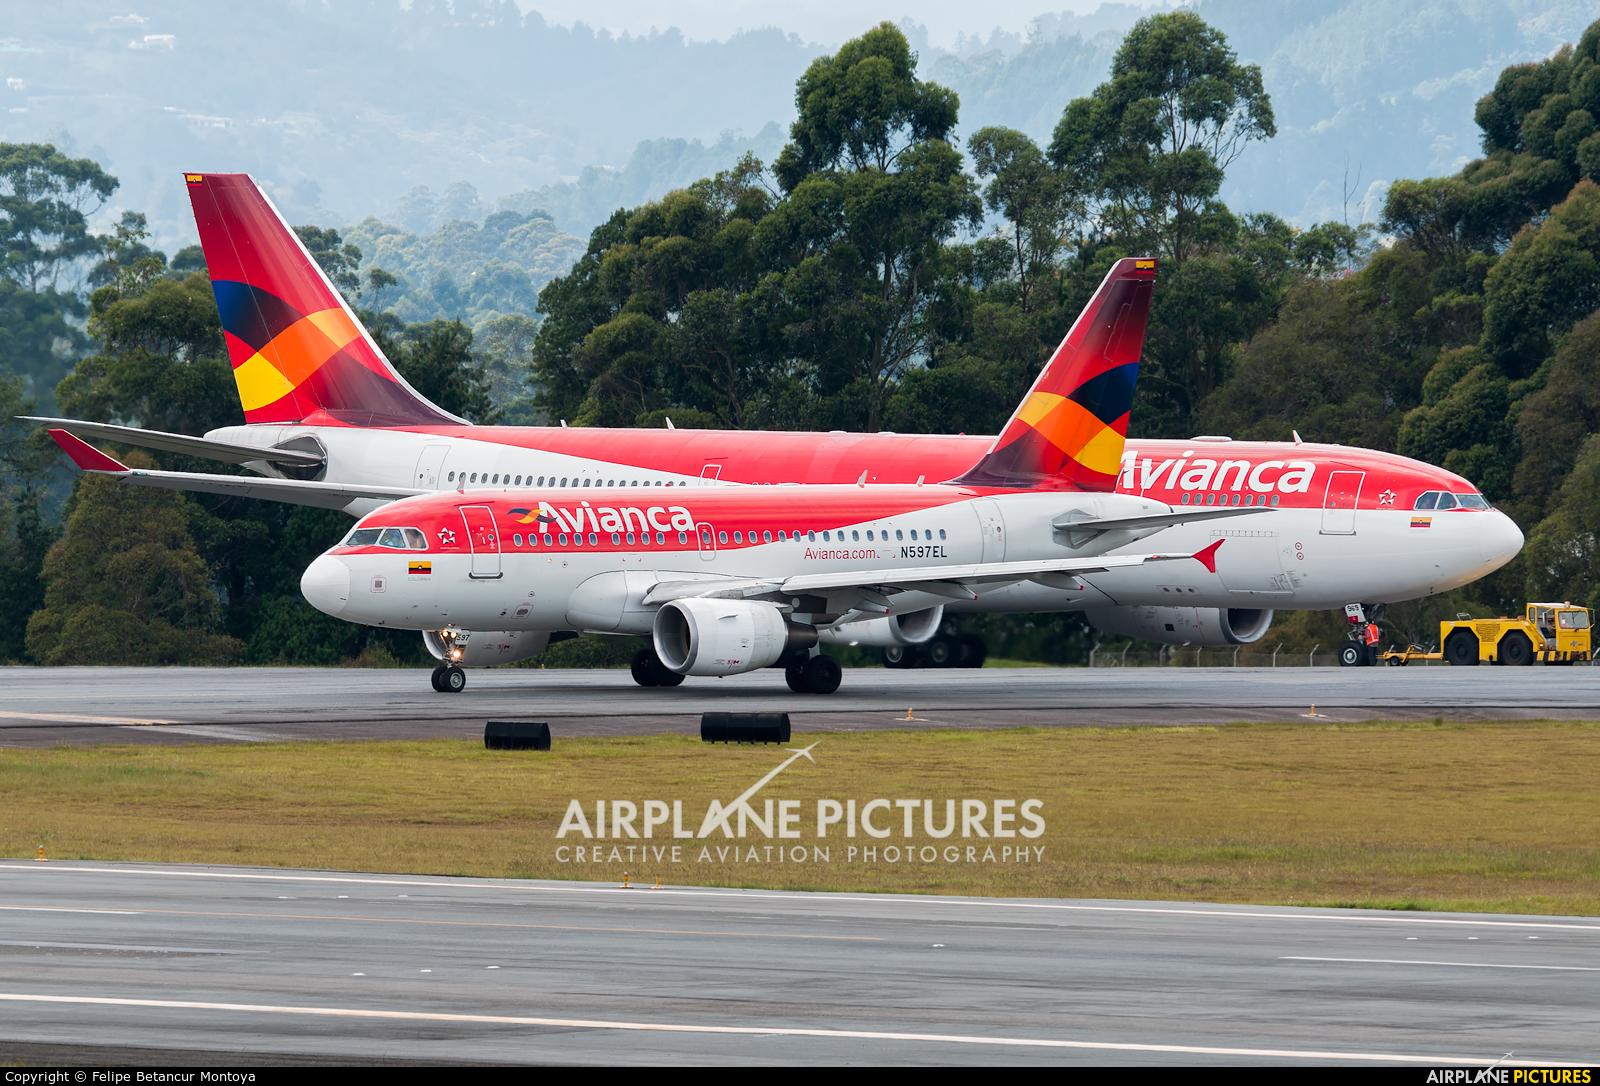 Avianca N597EL aircraft at Medellin - Jose Maria Cordova Intl